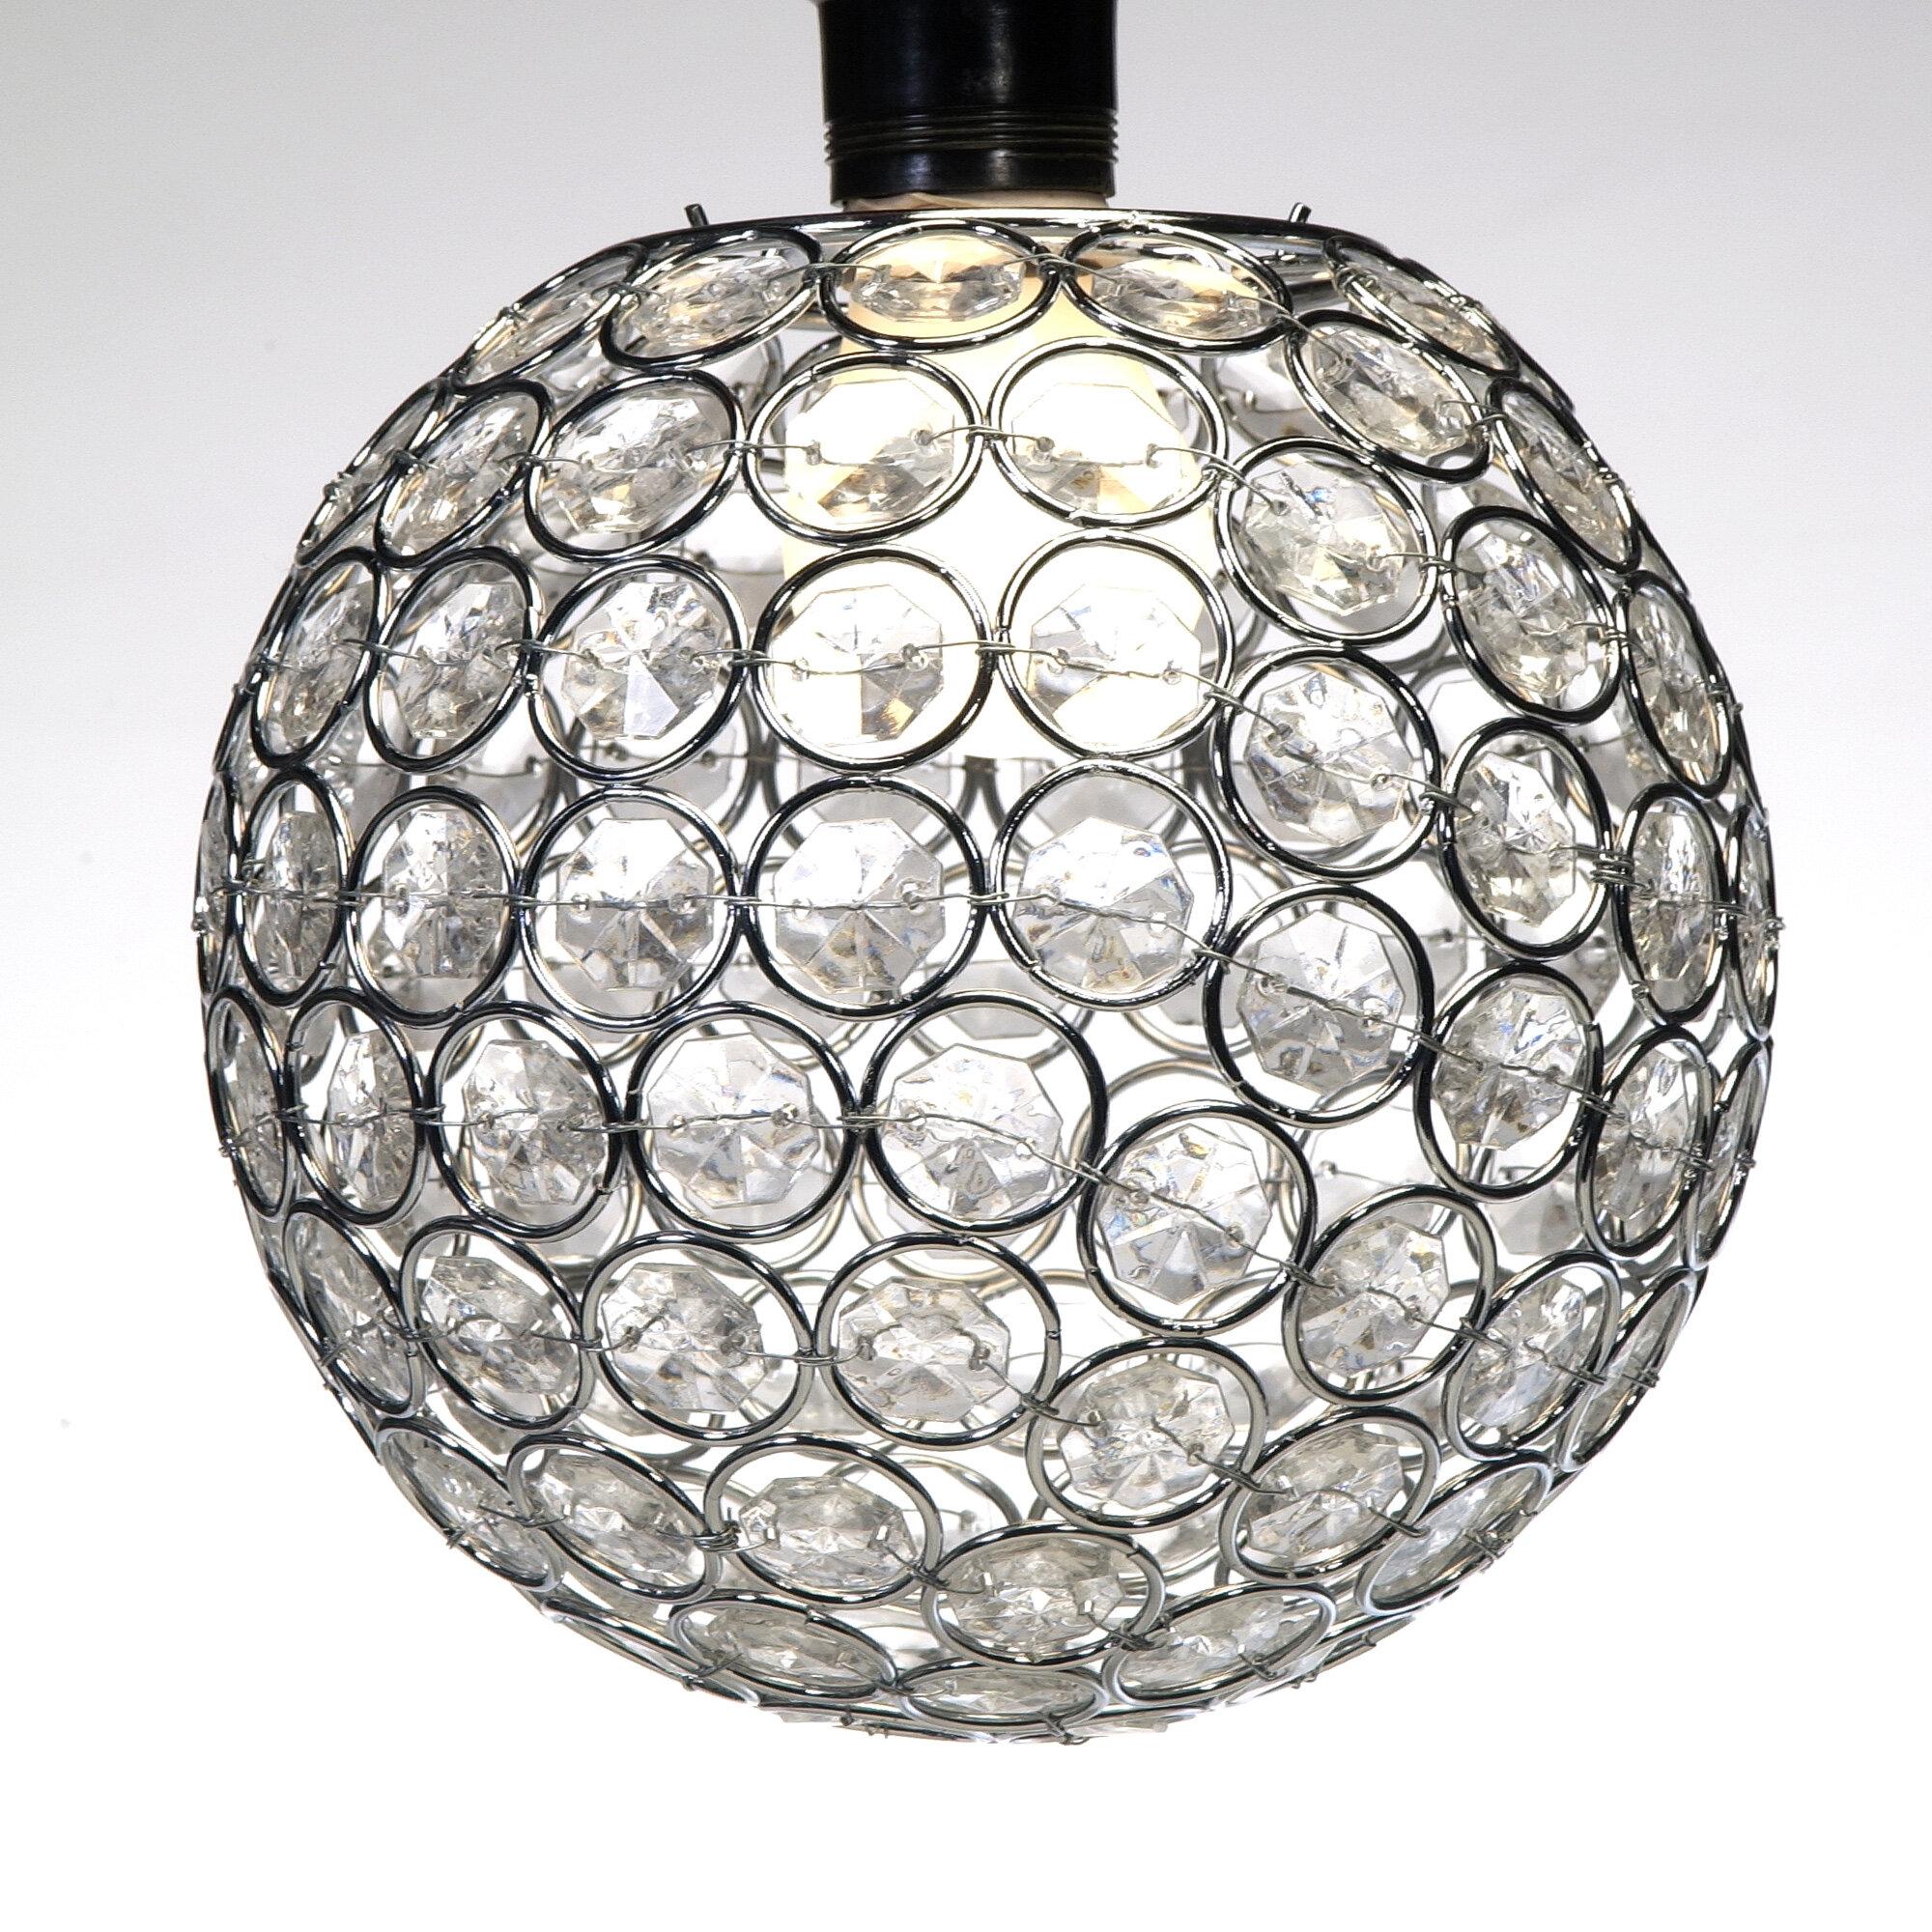 House of hampton bloomquist 6 5 crystal globe chandelier wayfair